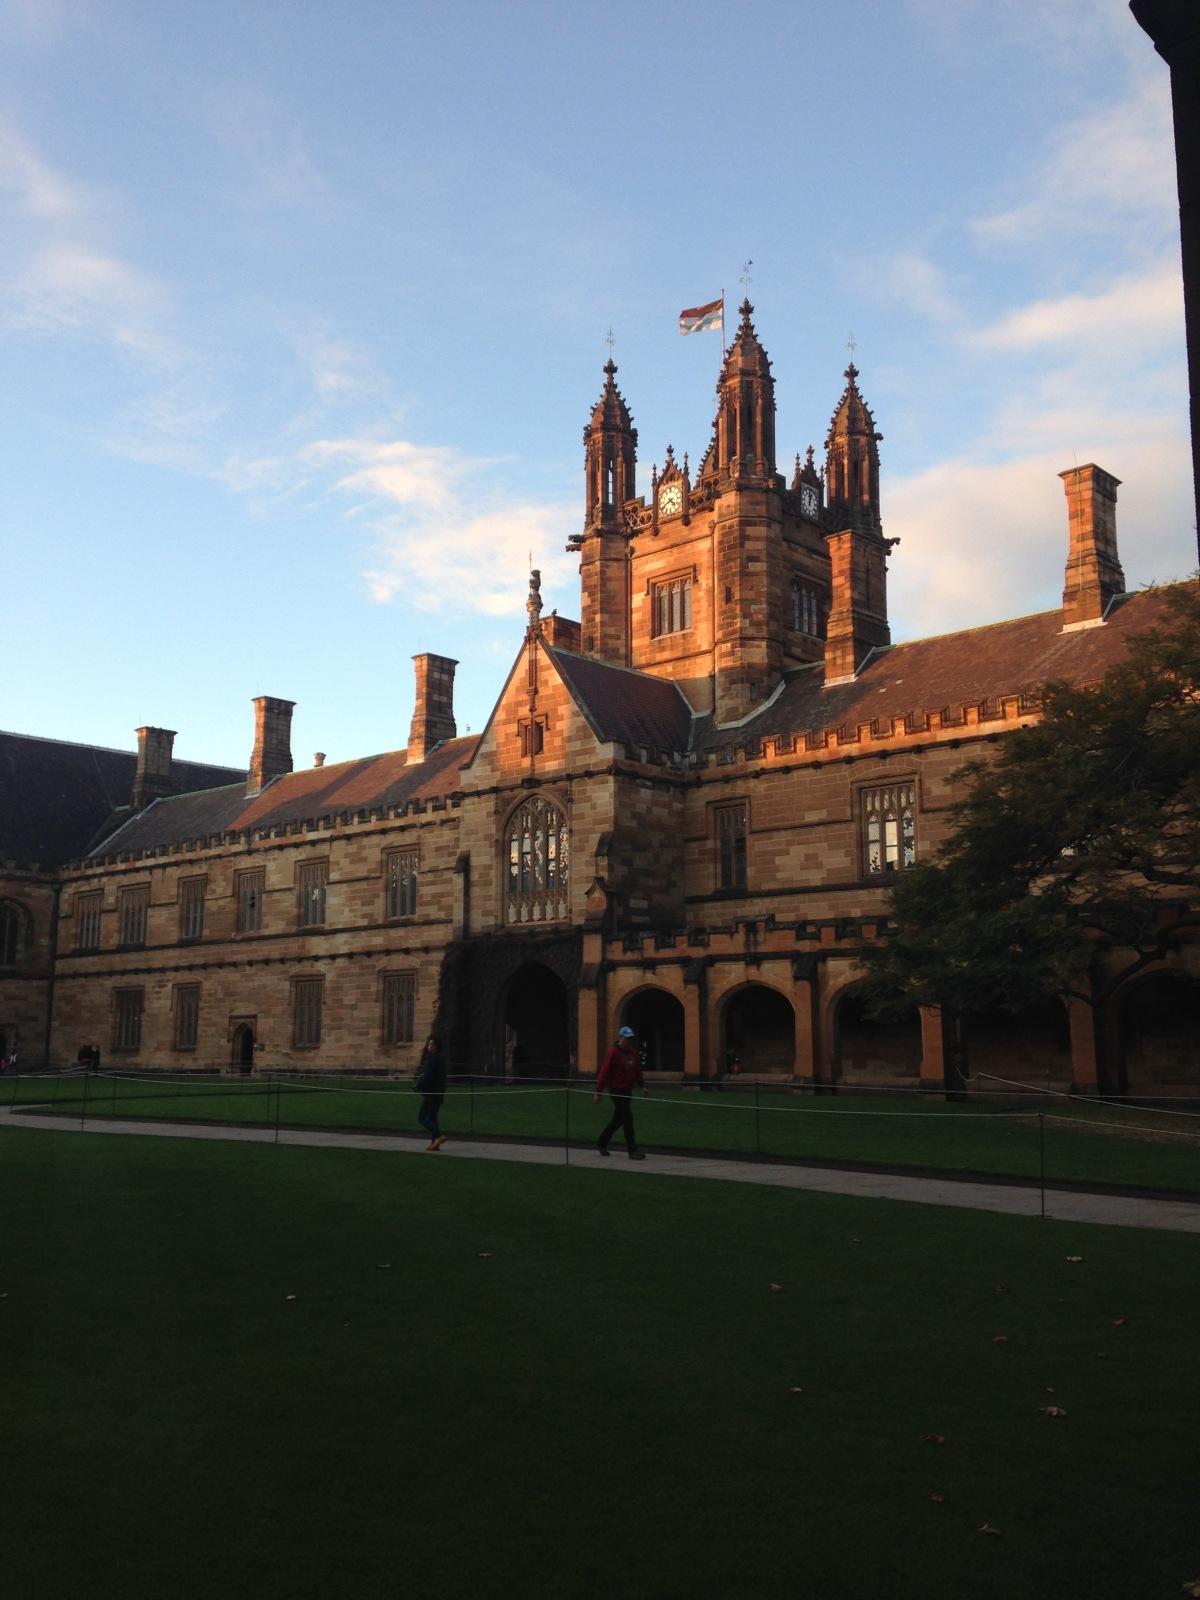 University of Sydney: AlmostThere!